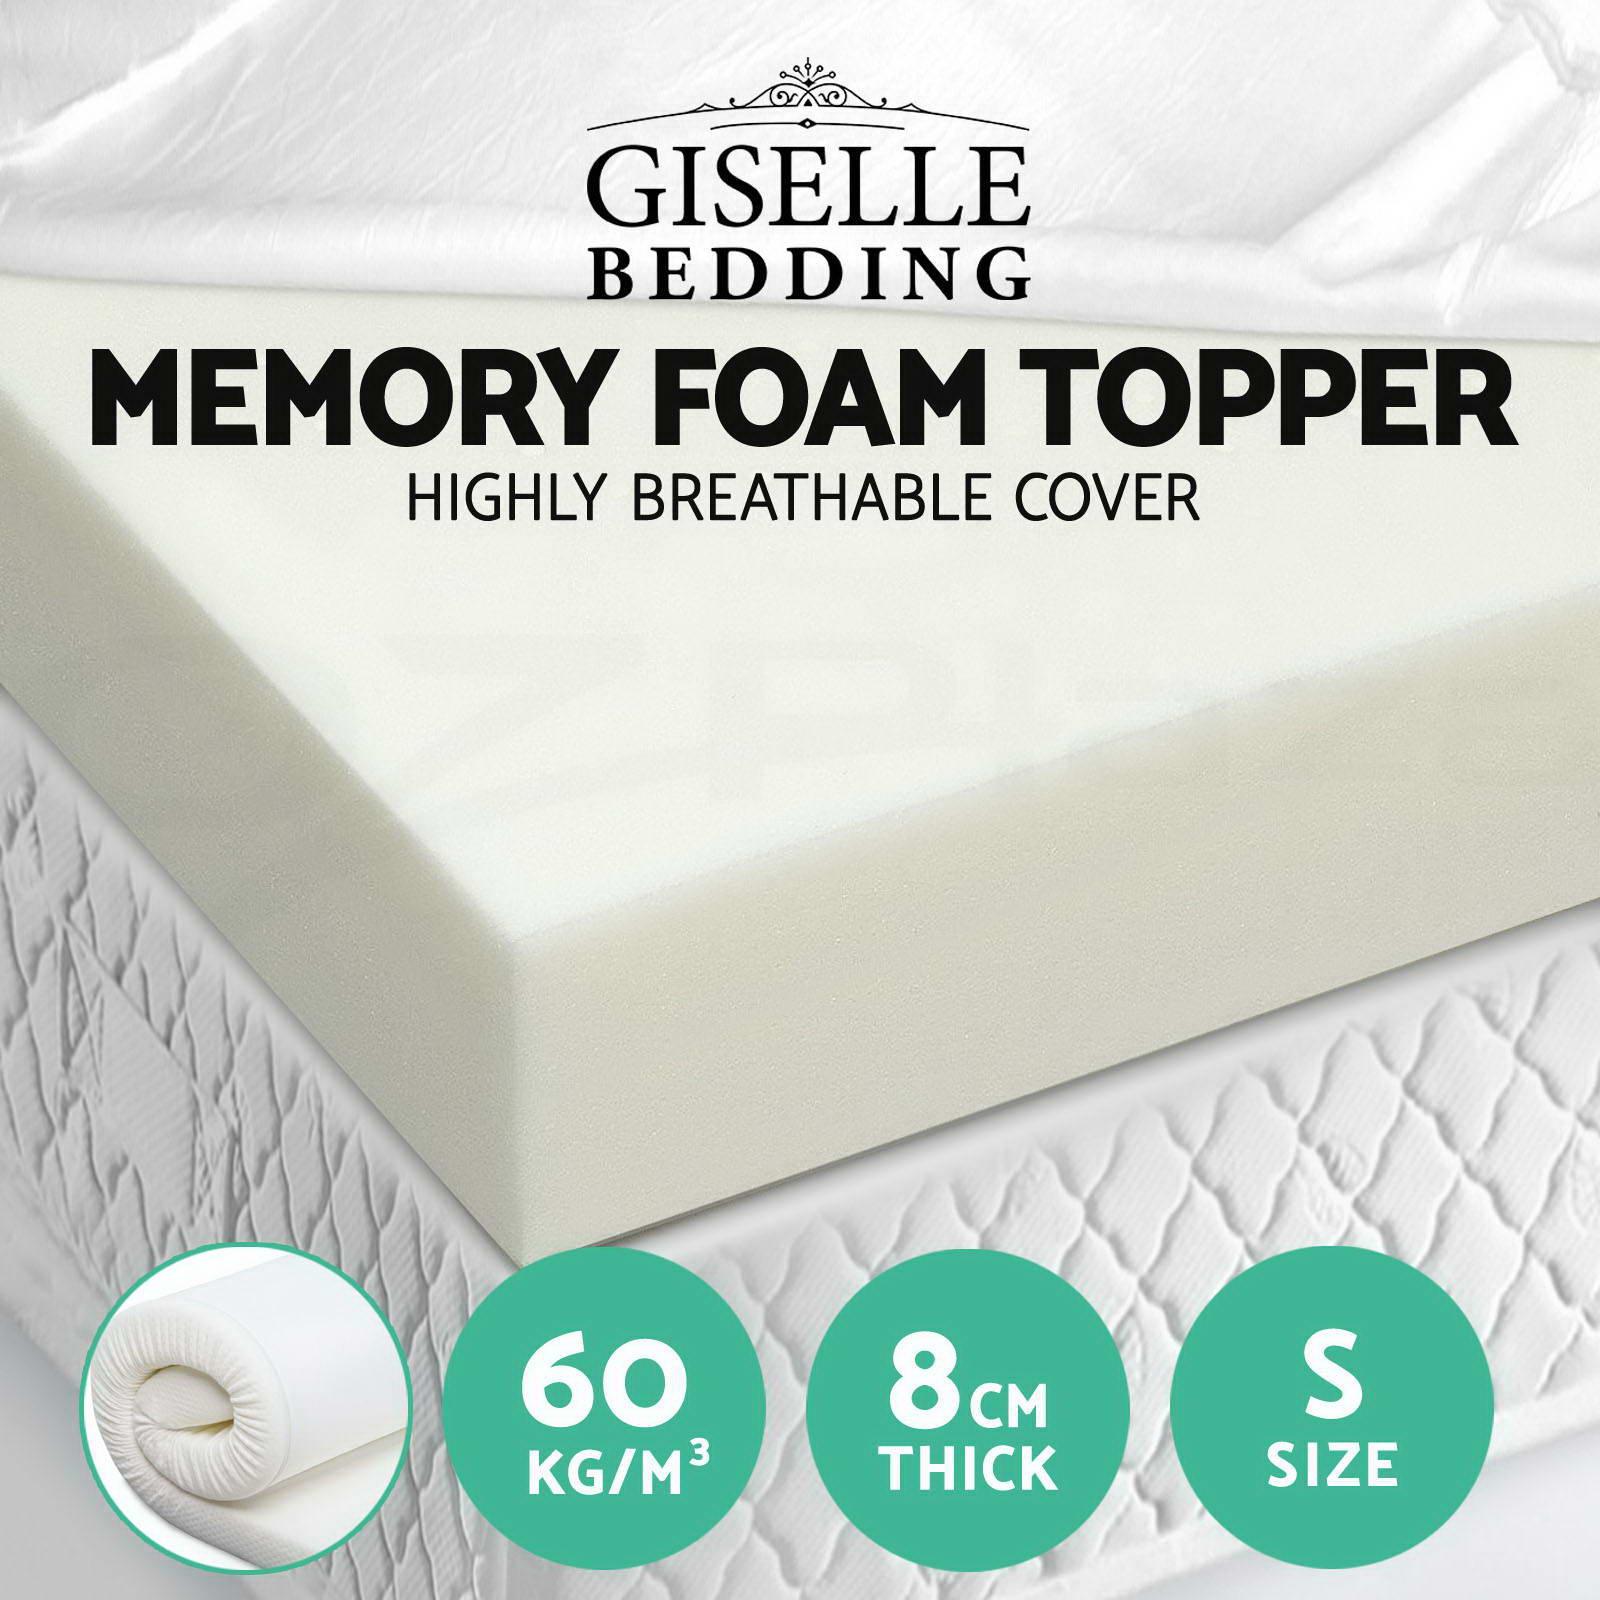 memory foam mattress topper single size 8cm visco elastic. Black Bedroom Furniture Sets. Home Design Ideas